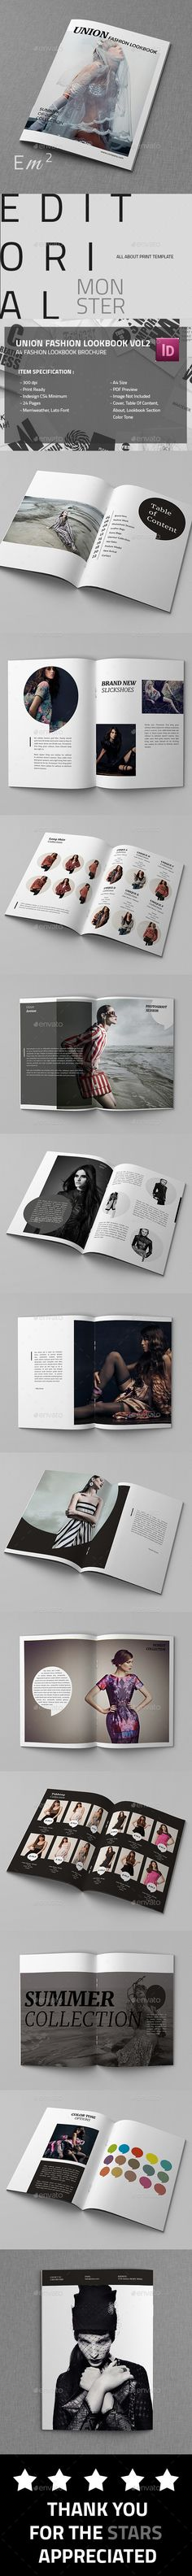 A4 Union - Fashion Lookbook Template #design Download: http://graphicriver.net/item/a4-union-fashion-lookbook-vol2/12796819?ref=ksioks